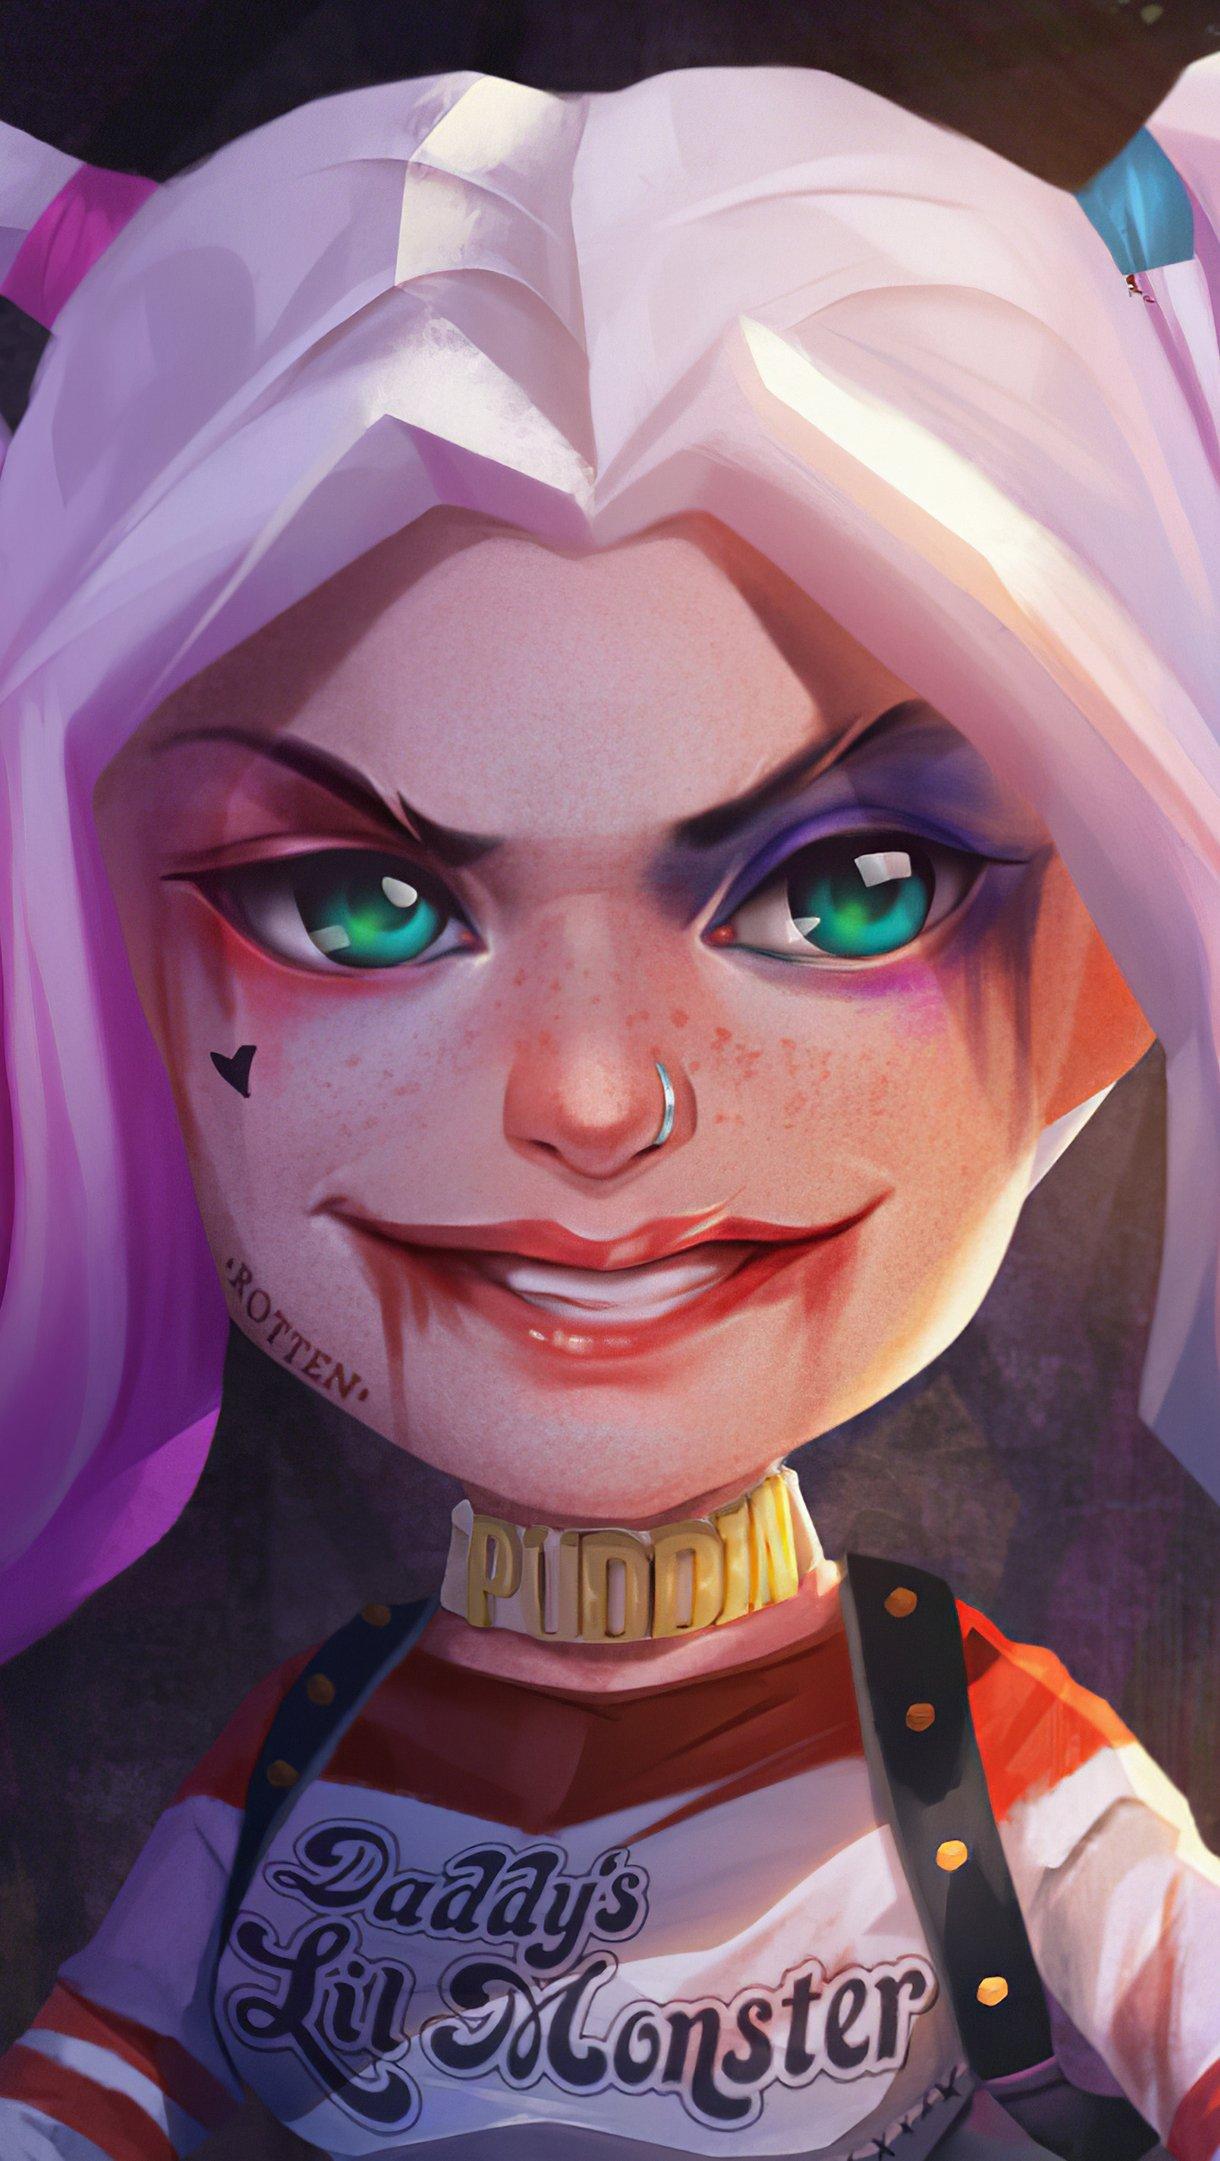 Fondos de pantalla Harley Quinn como funko pop Fanart Vertical